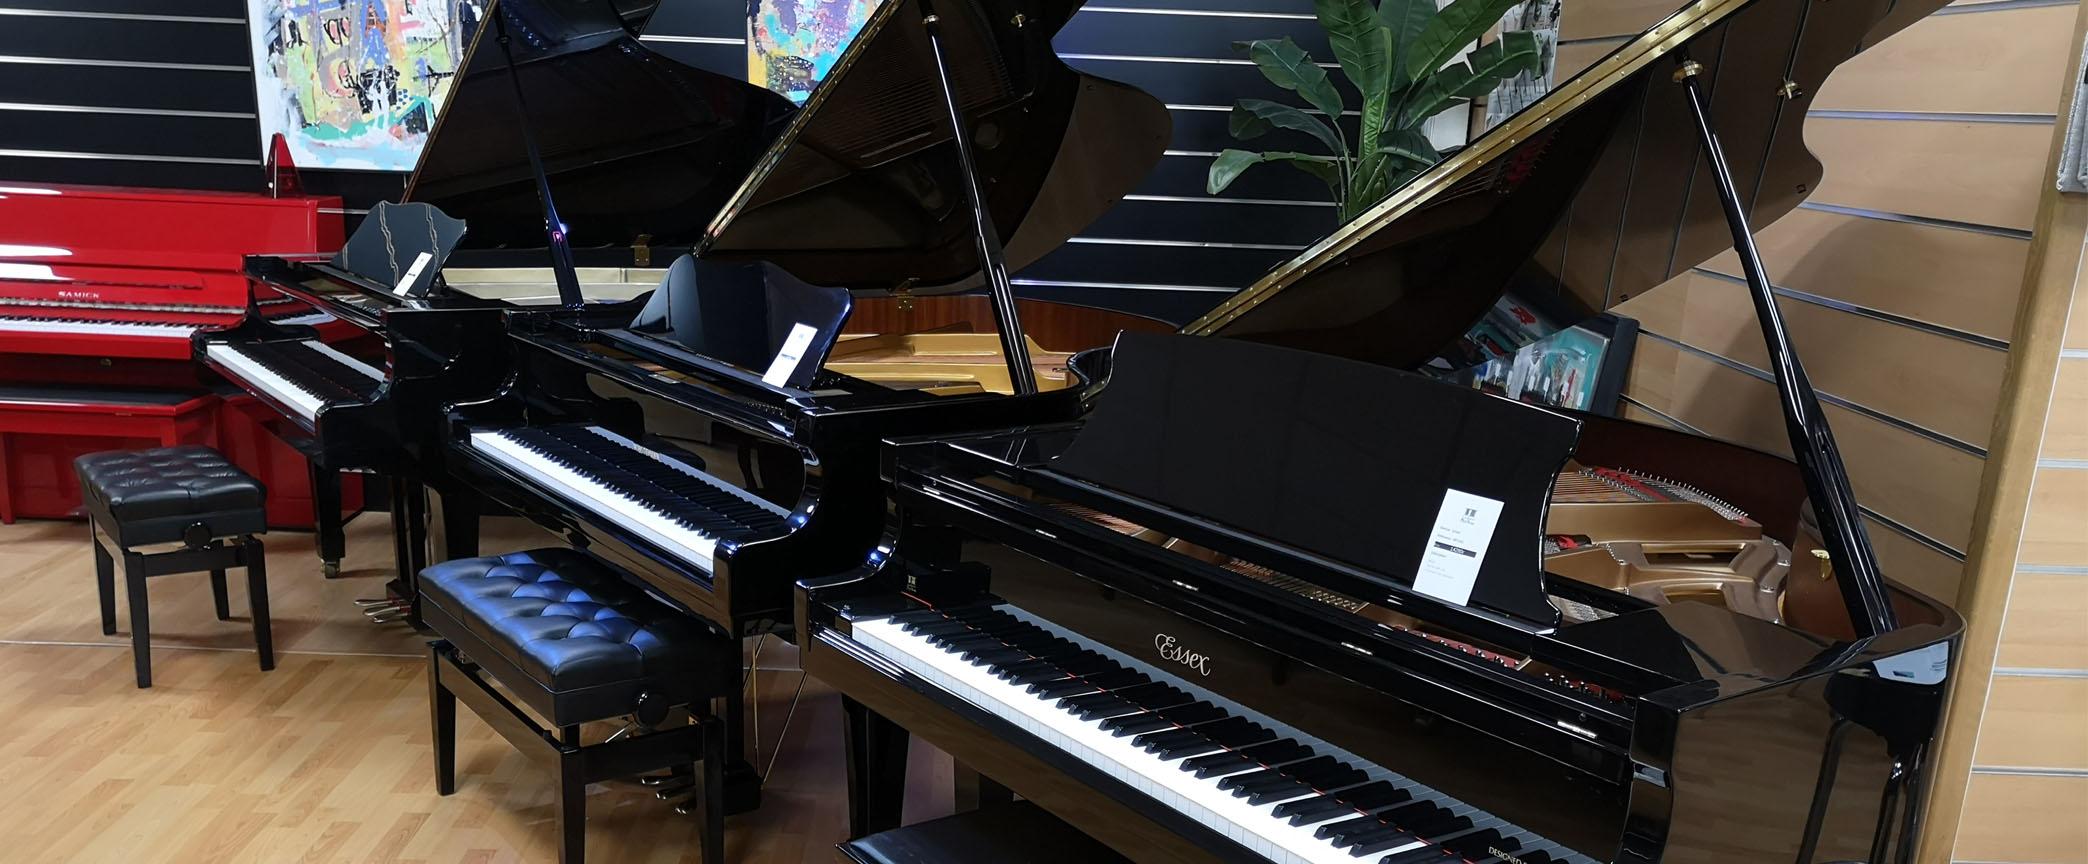 photo pianos 2